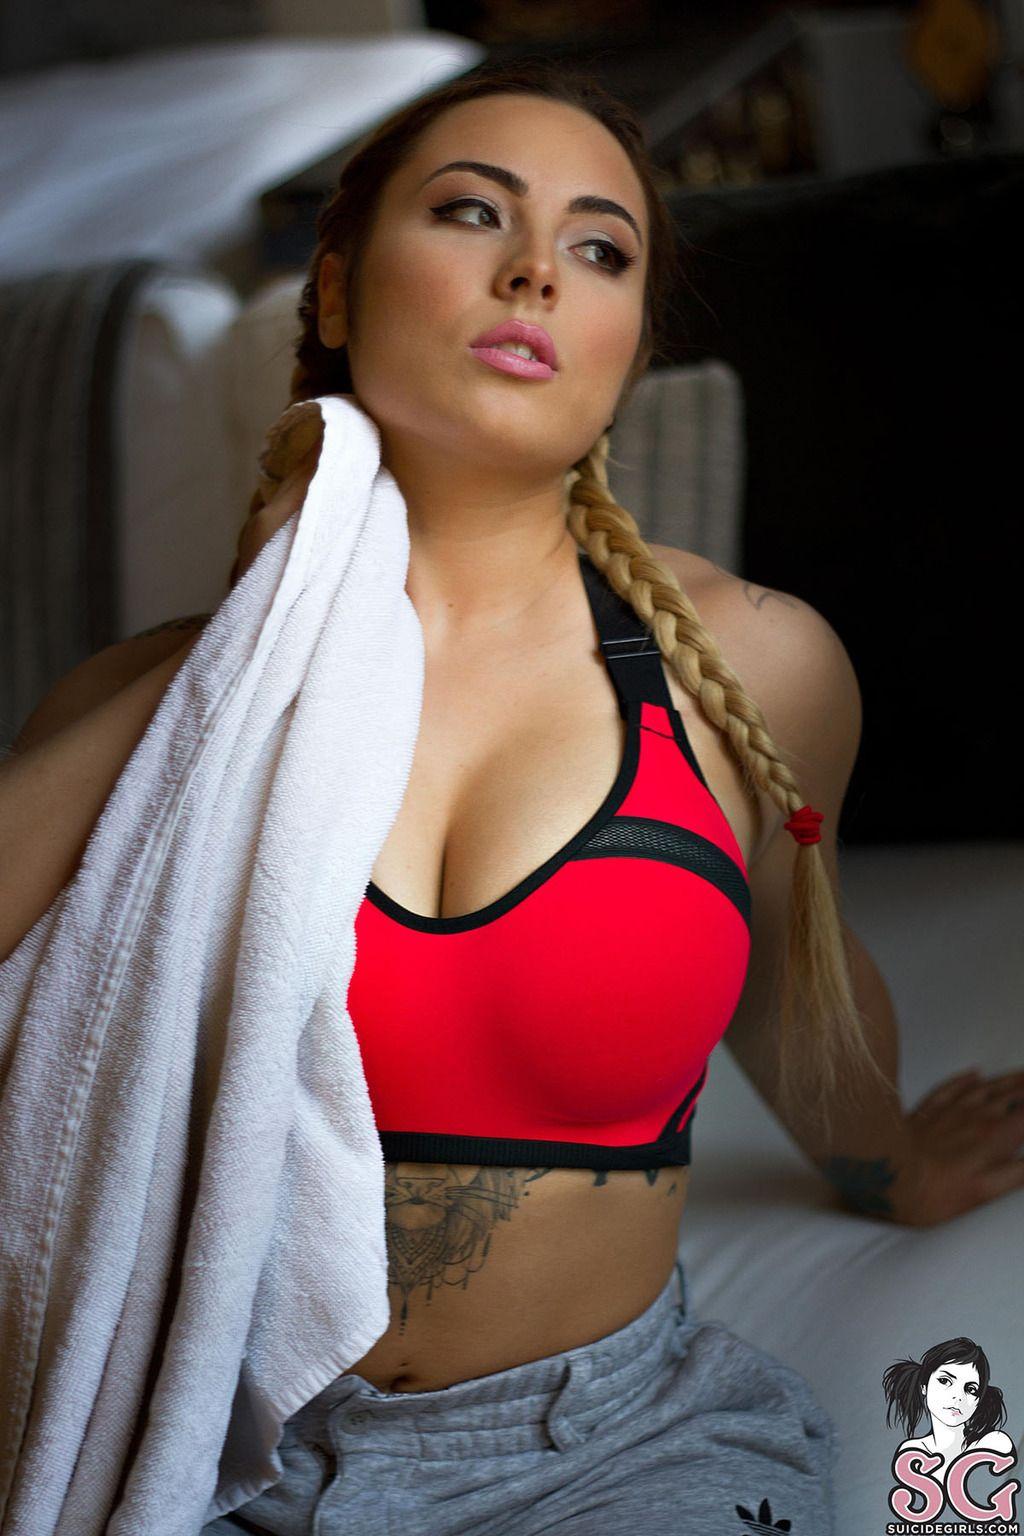 Tamilnadu hot girl image